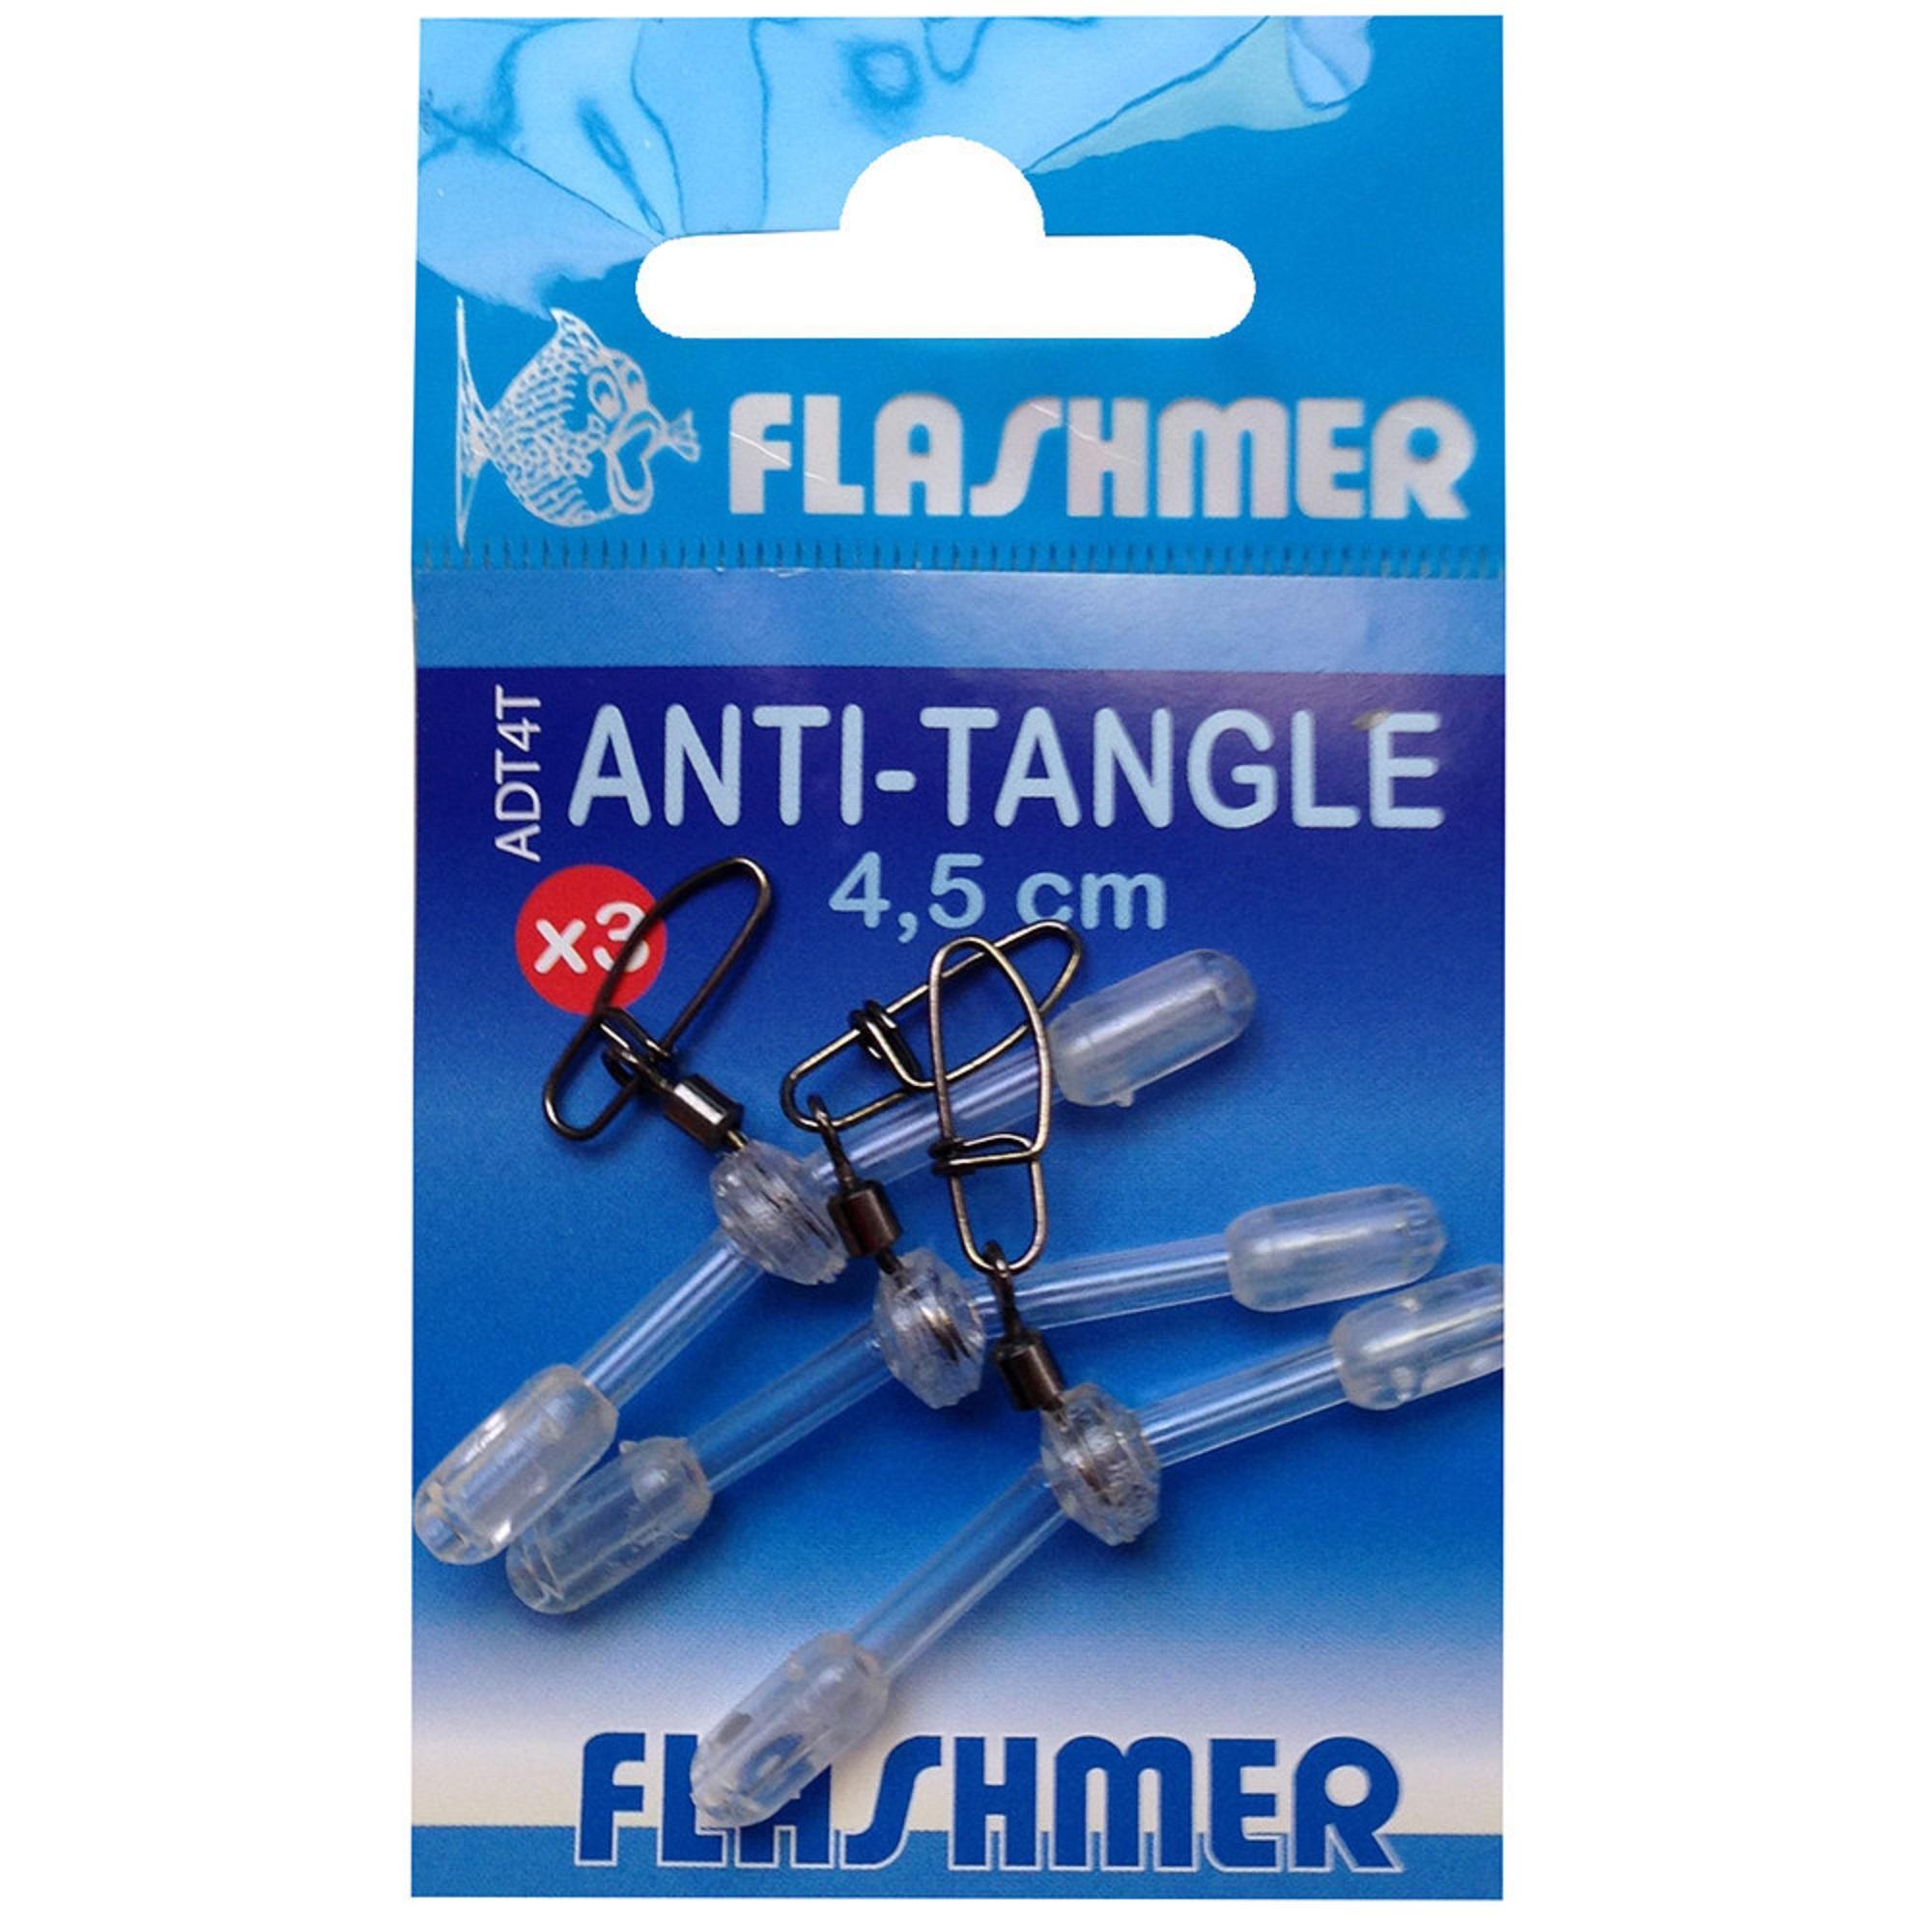 Anti Tangle 4.5cm imagine